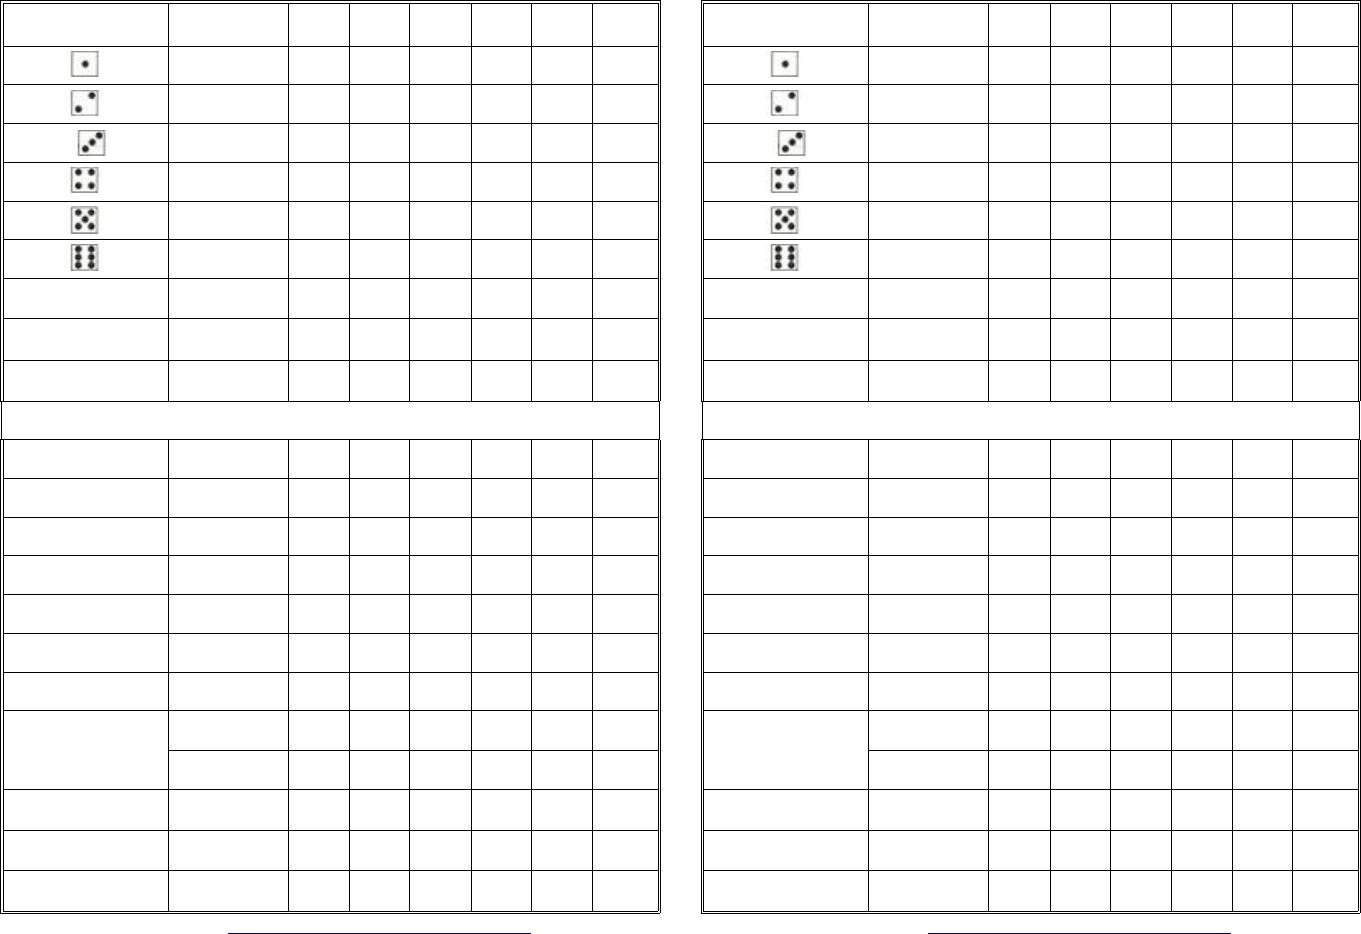 Yahtzee Score Sheets | Games | Pinterest